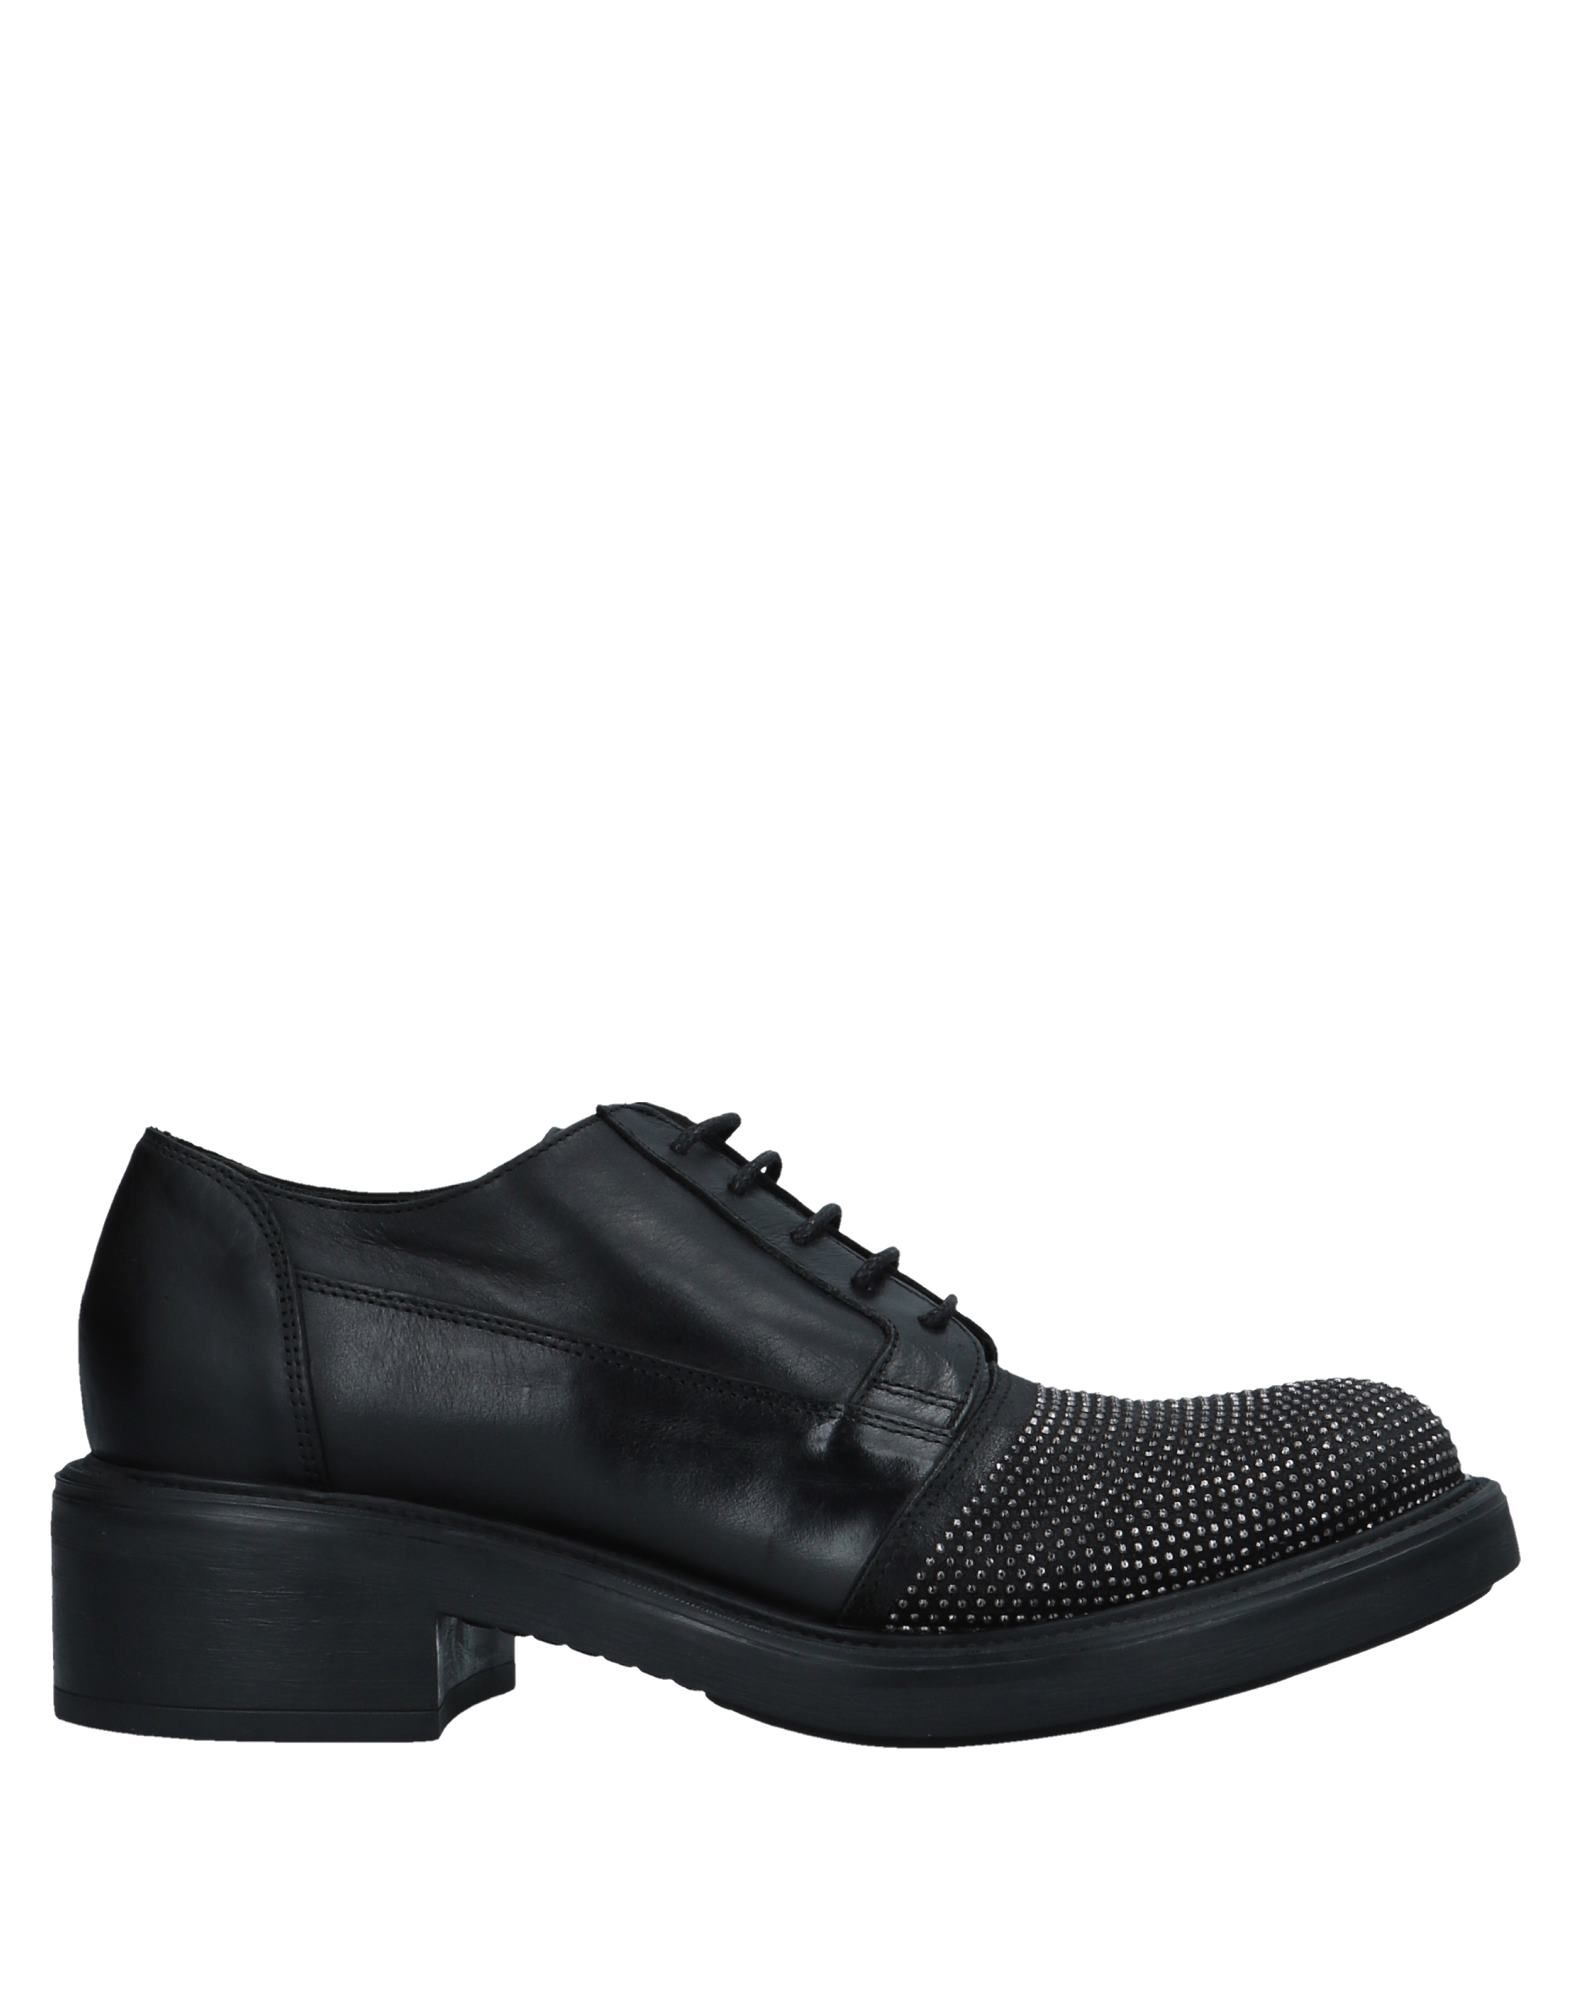 LINO RICCI Обувь на шнурках ботинки dino ricci ботинки на шнурках